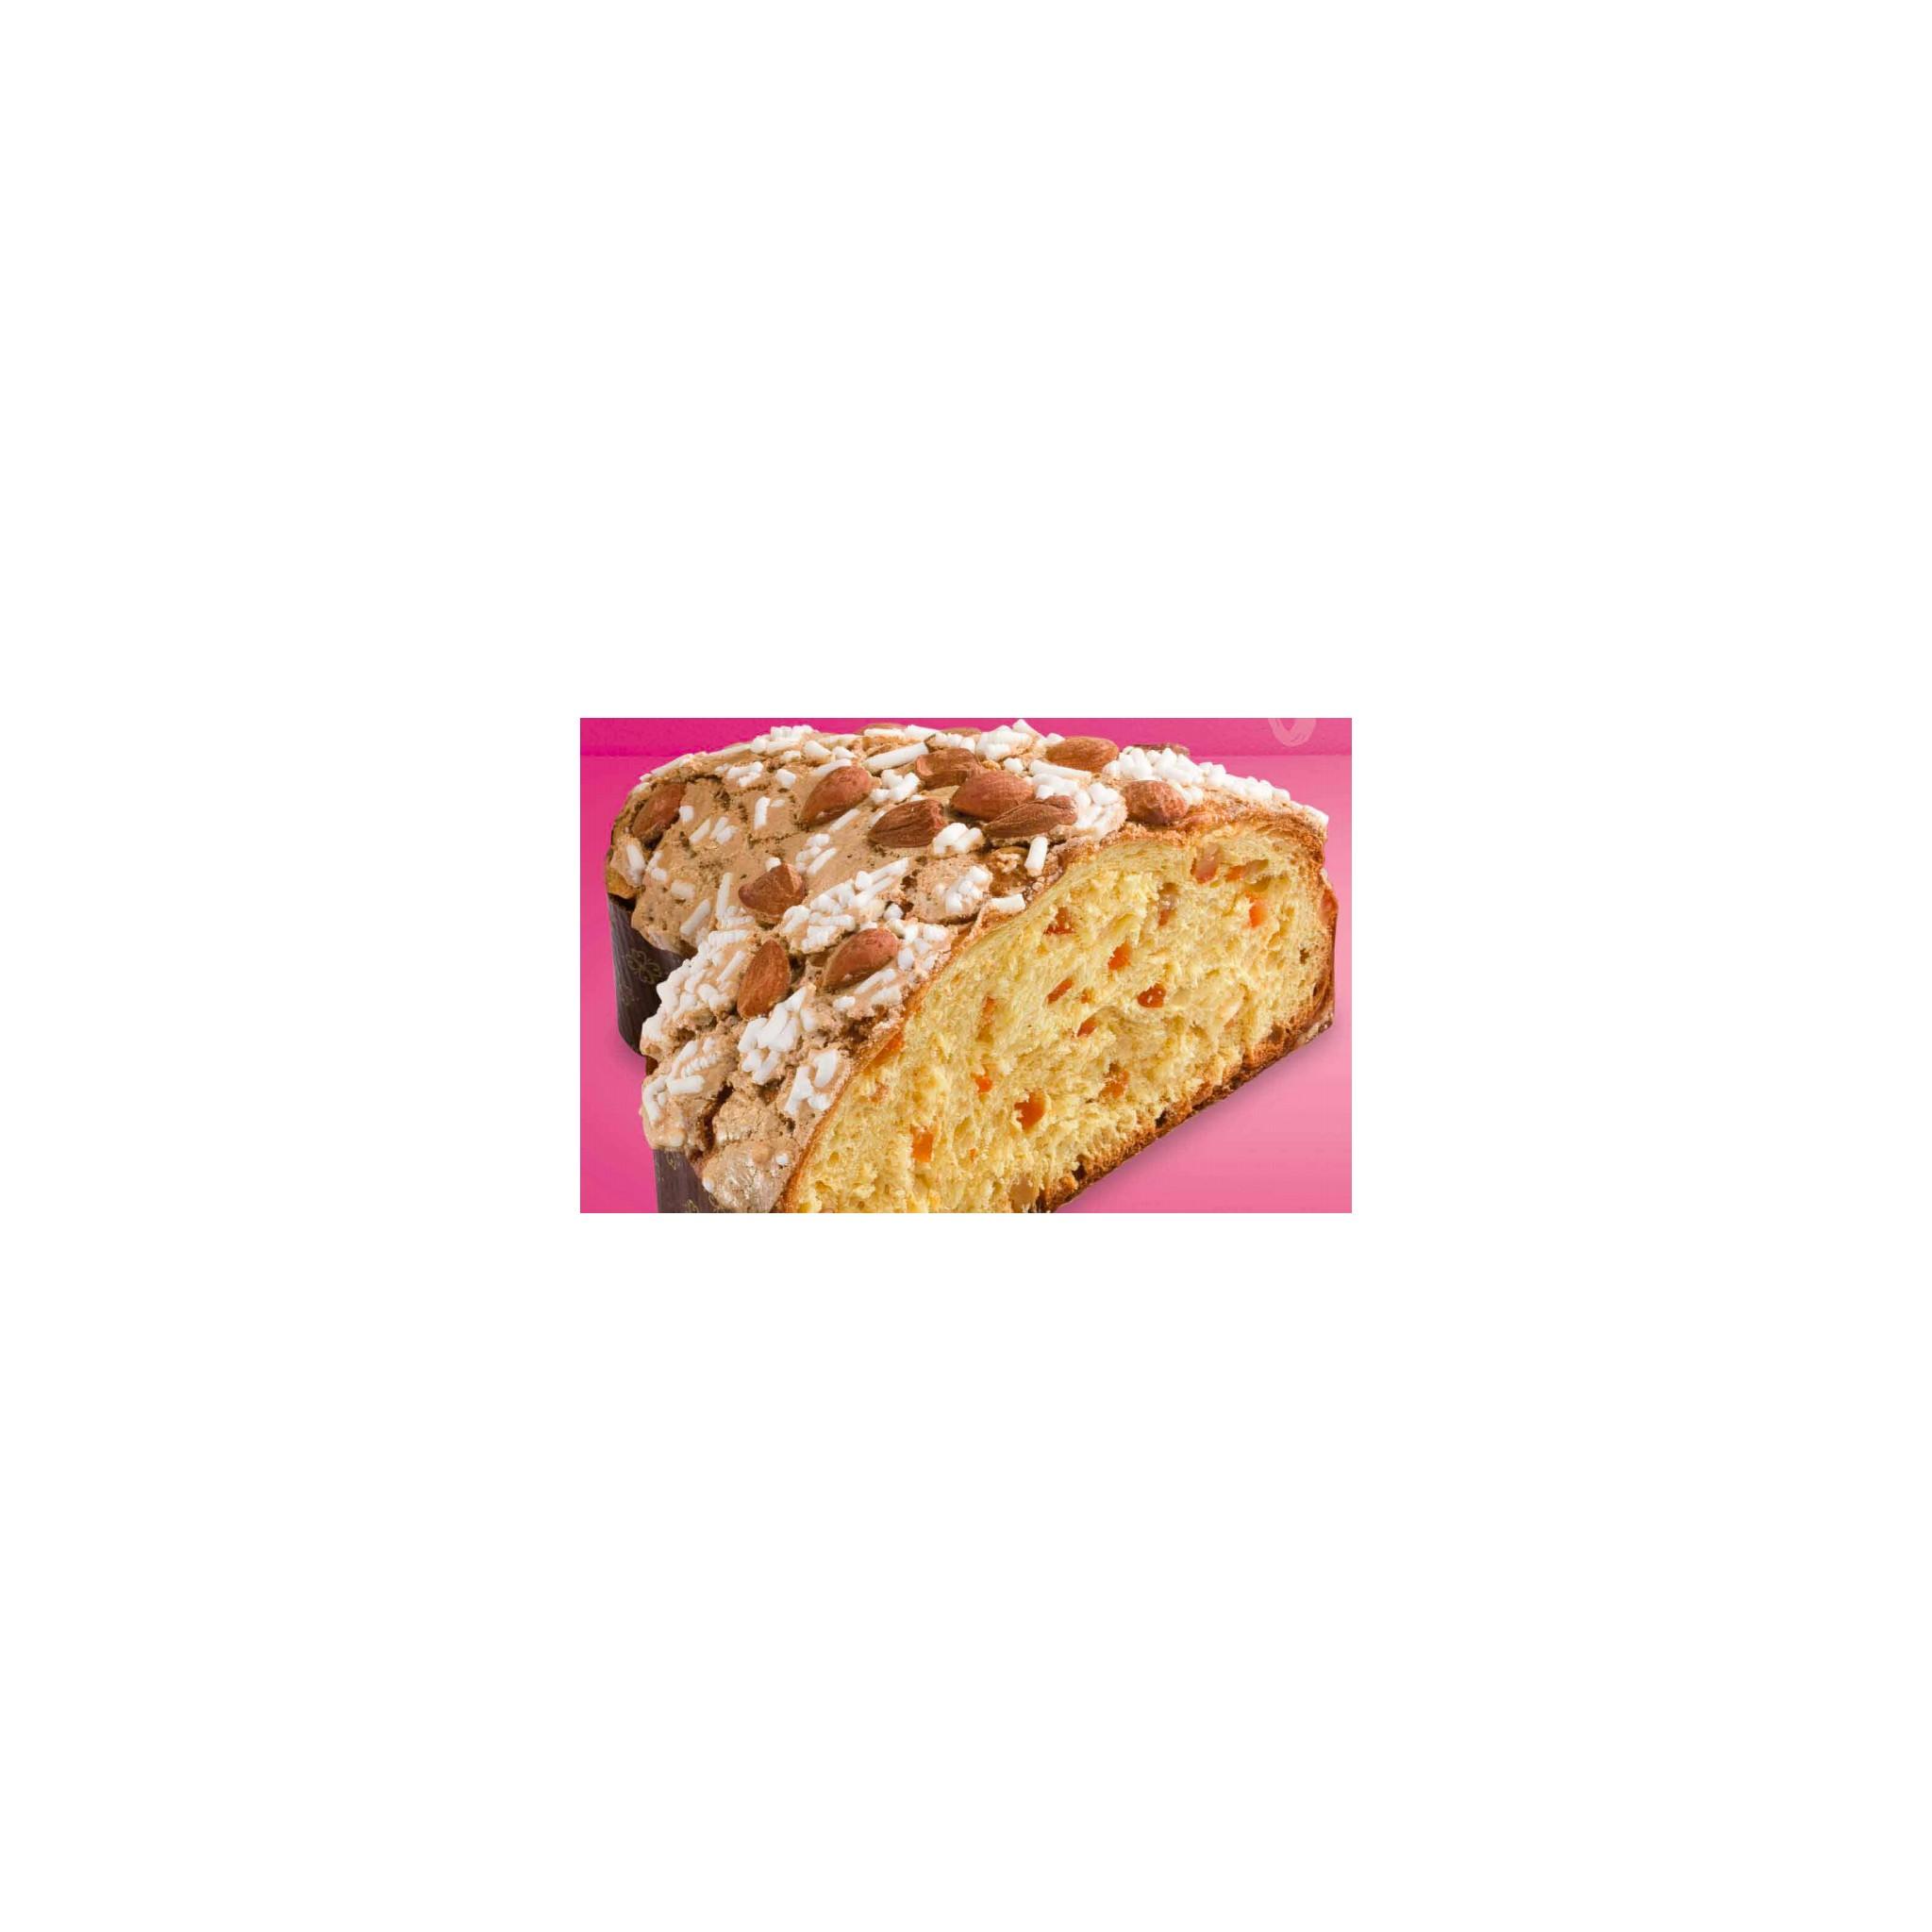 Buy Online Filippi Pastry Shop Italian Easter Cake With